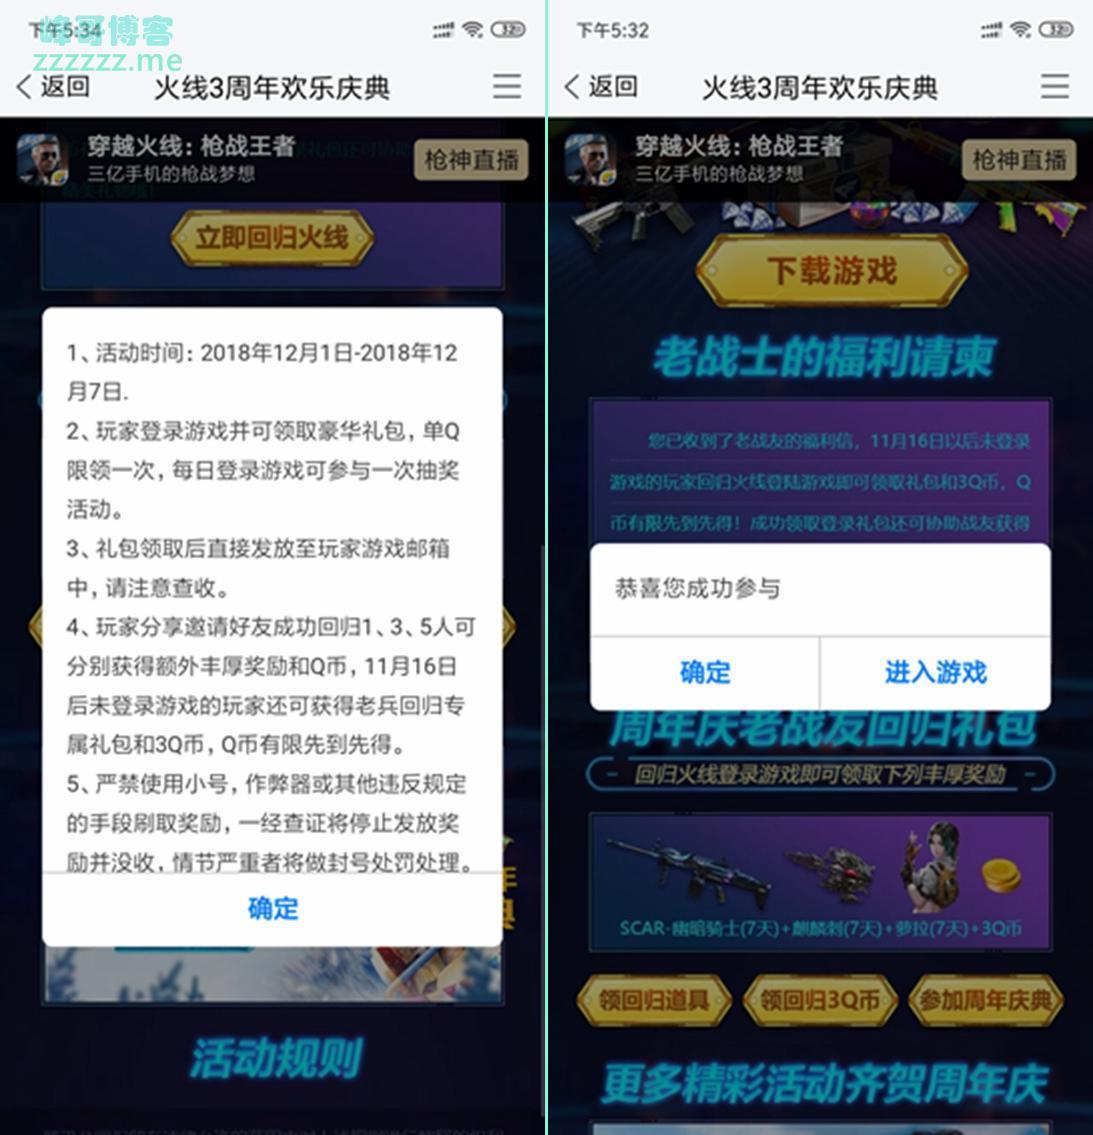 CF穿越火线手游 火线三周年欢乐庆典活动领3QB秒到账!